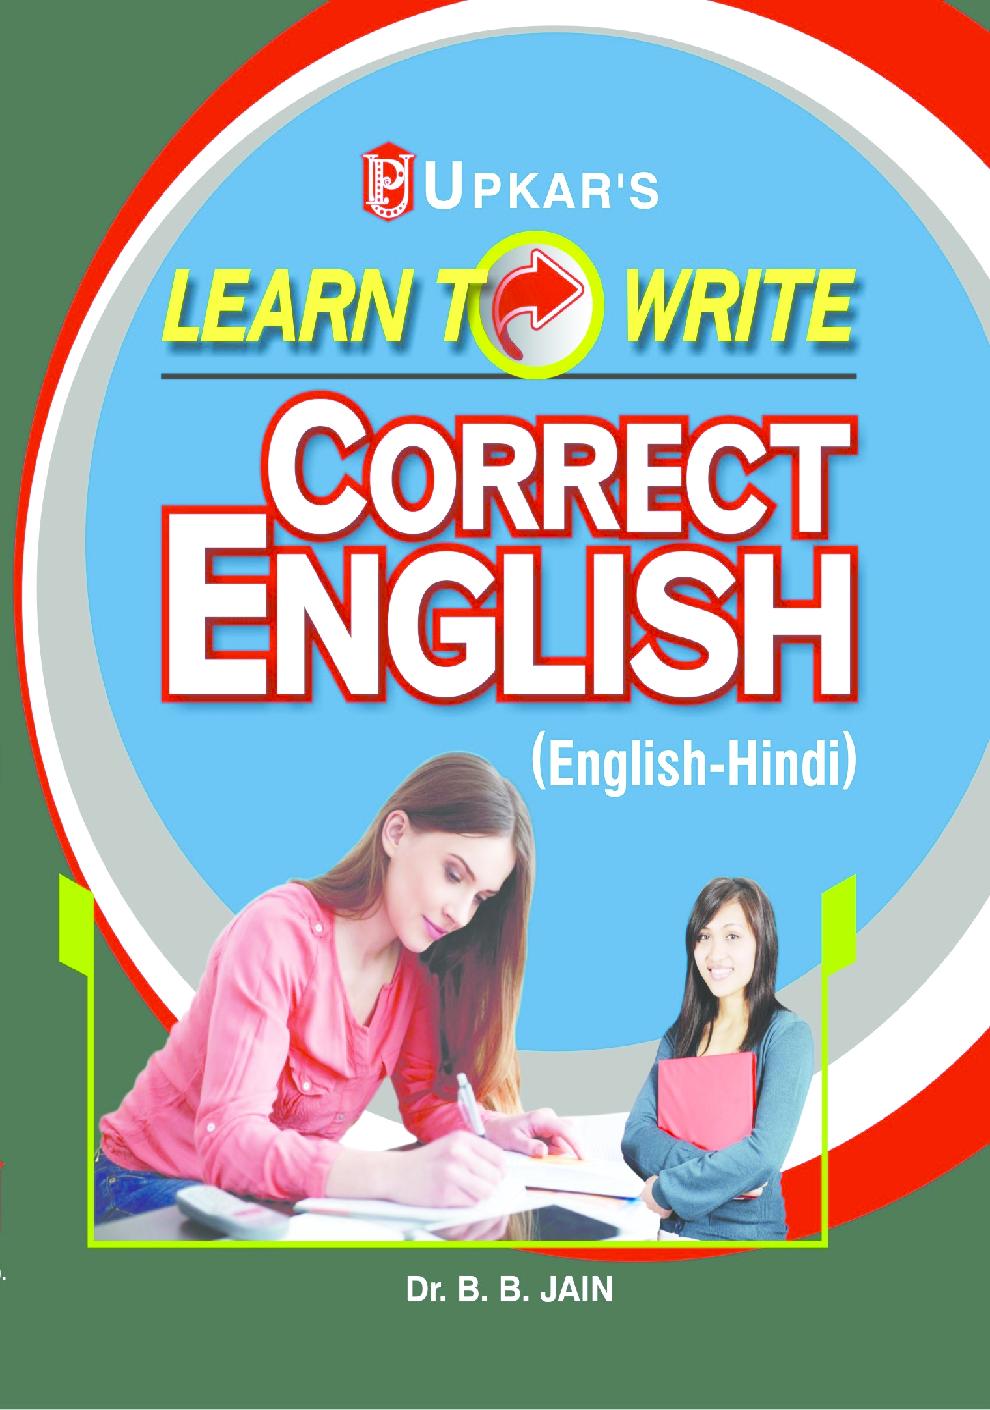 How to write correct english pdf